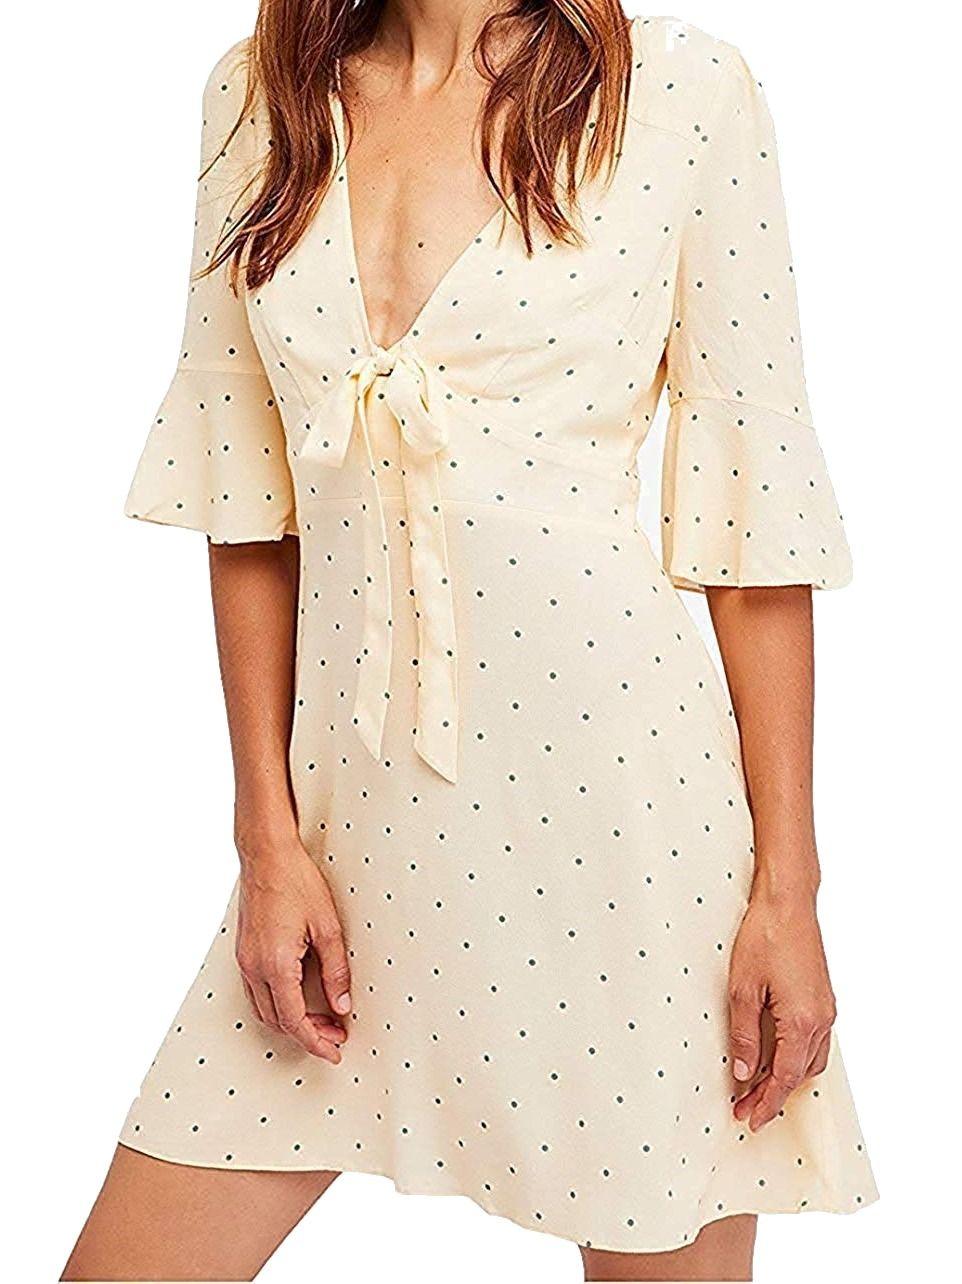 Free People Free People Womens All Yours Mini Dress Walmart Com Women S Fashion Dresses Dresses Fashion [ 1284 x 962 Pixel ]